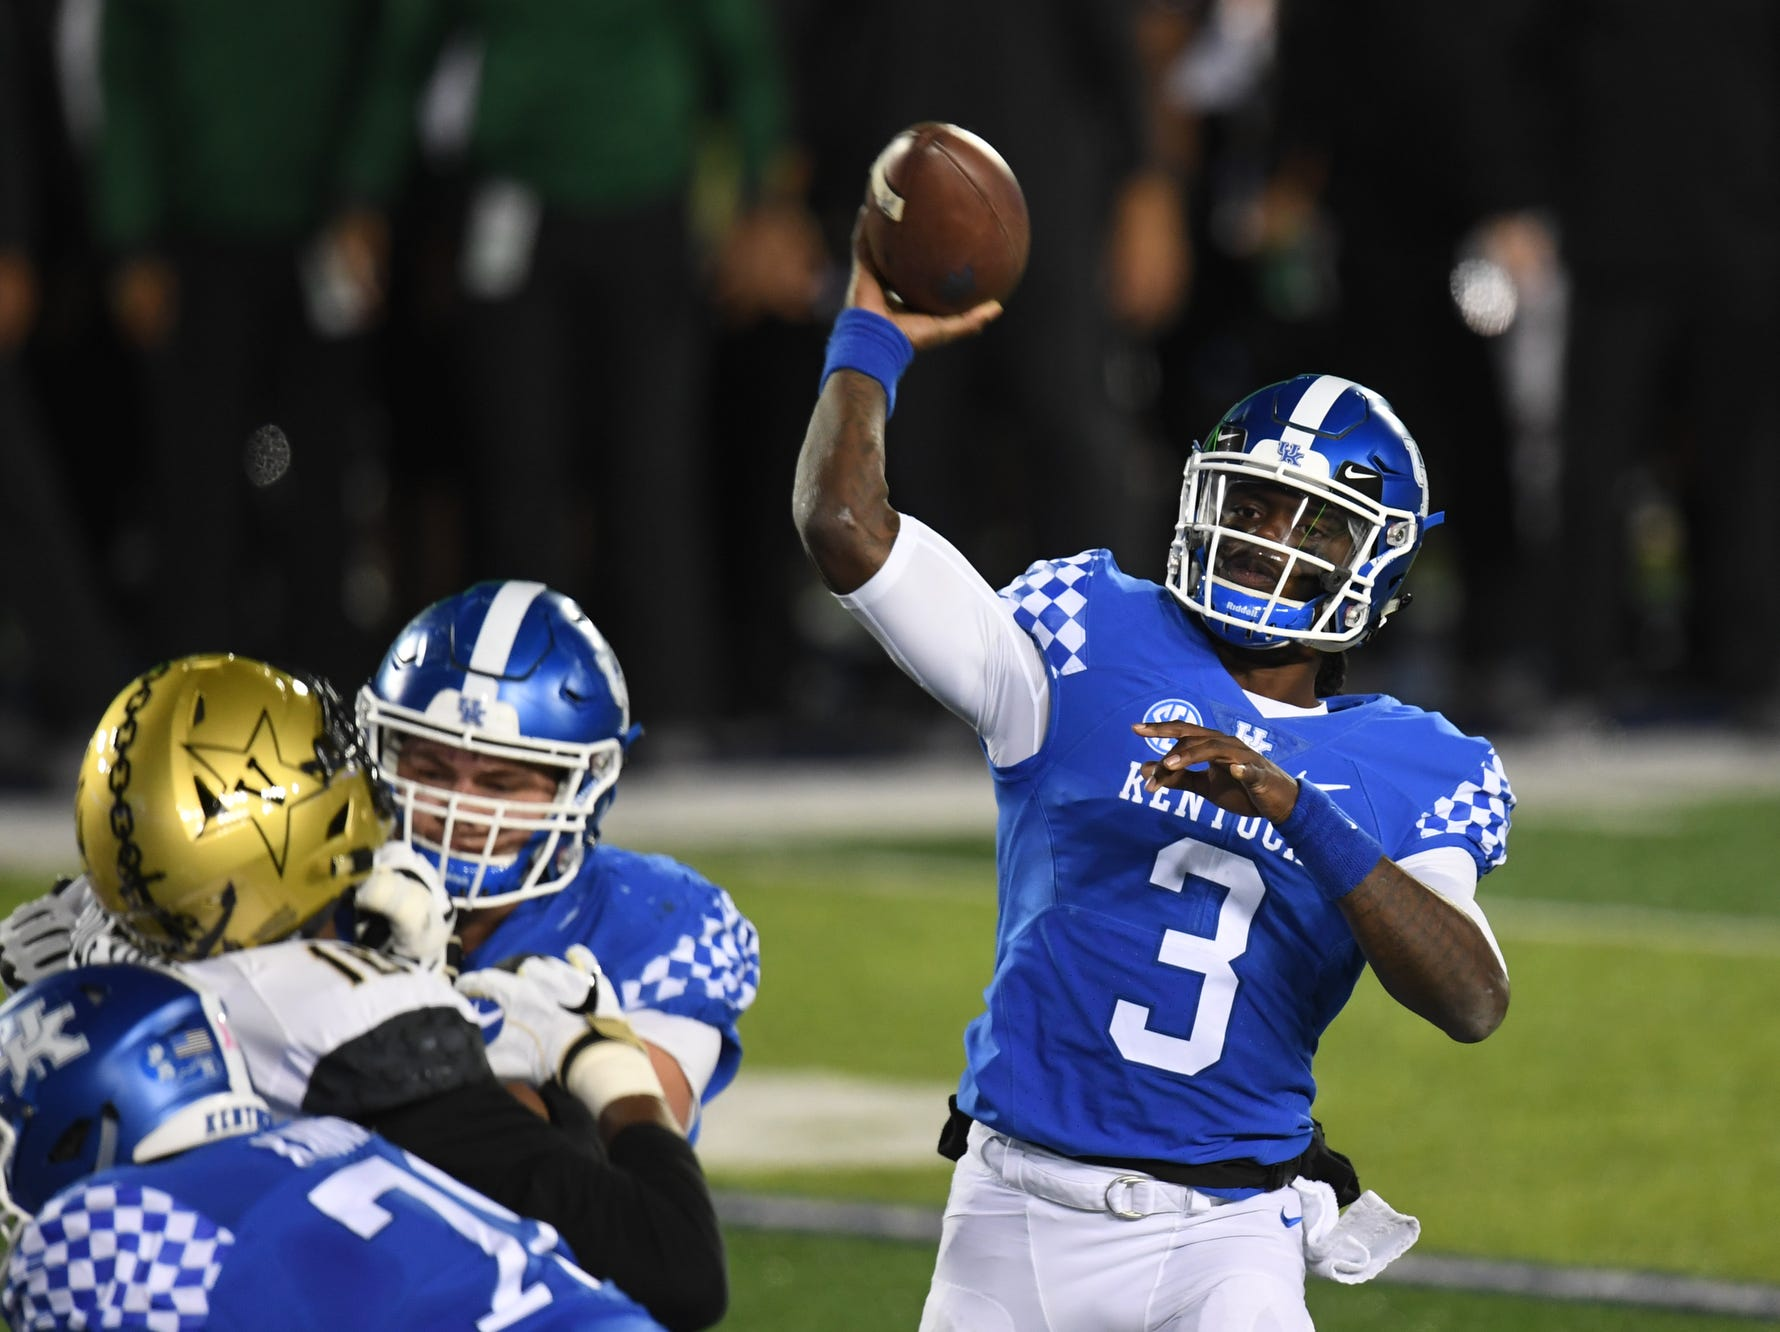 UK QB Terry Wilson throws a touchdown pass to WR Lynn Bowden, Jr. during the University of Kentucky football game against Vanderbilt at Kroger Field in Lexington, Kentucky on Saturday, October 20, 2018.